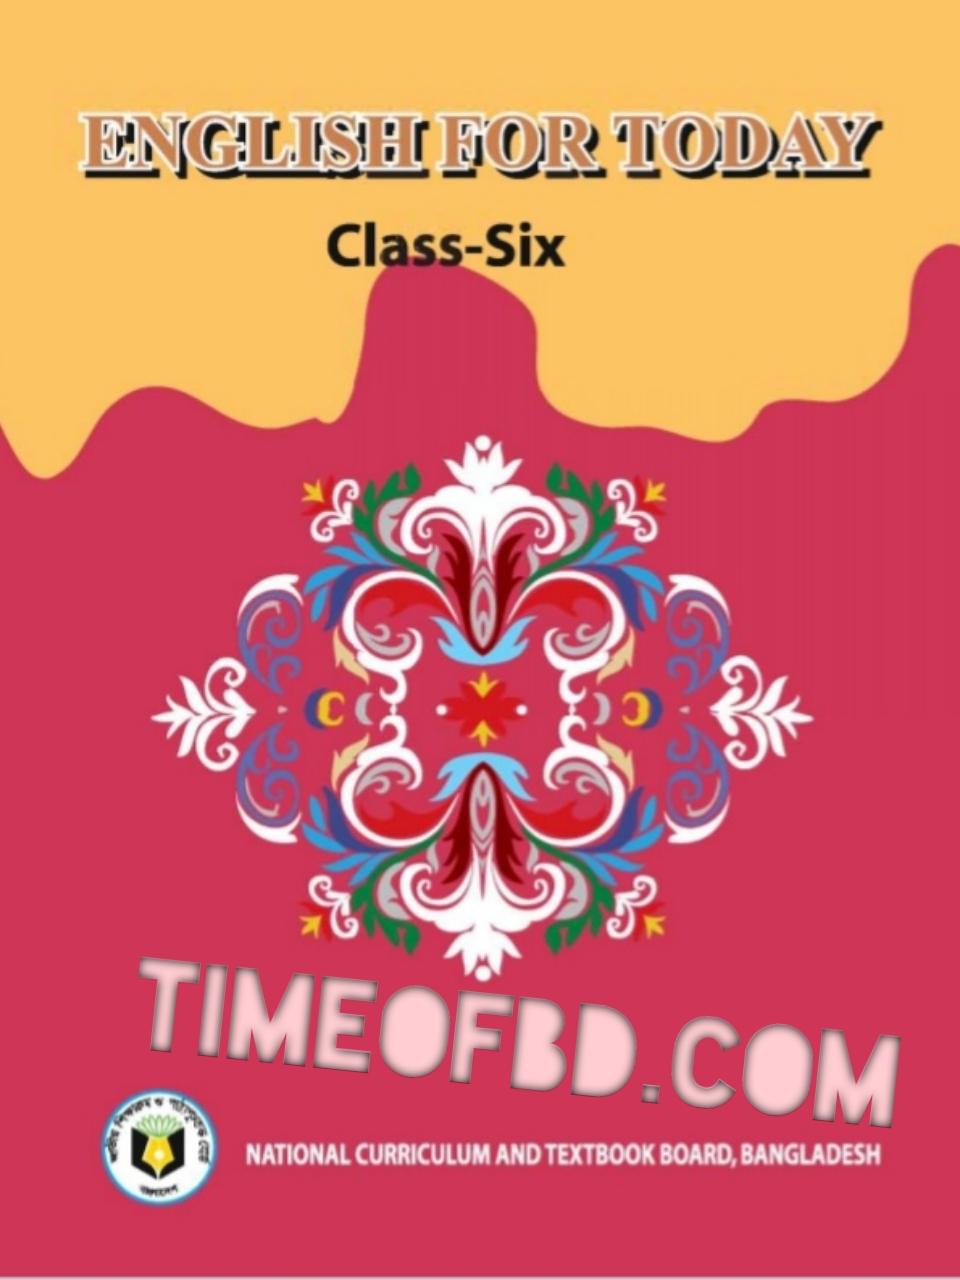 Class 6 english 1st paper book 2021, class 6 english 1st paper book pdf, class 6 english 1st paper question, class 6 english 1st paper boi, class six english 1st paper book 2021, class six english 1st paper book pdf, class six english 1st paper book nctb, class six english 1st paper guide 2021, class six english 1st paper guide pdf, class six english 1st paper note book 2021, class 6 english 1st paper book pdf in Bengali, nctb book of class six, class 6 english 1st paper  book solution, class 6 guide book pdf, class 6 guide book pdf 2021, ইংরেজি প্রথম পত্র বই class 6, গণিত বই pdf, আমার ইংরেজি প্রথম পত্র বই ষষ্ঠ শ্রেণি, ষষ্ঠ শ্রেণীর ইংরেজি প্রথম পত্র বই ডাউনলোড, ইংরেজি প্রথম পত্র বই ষষ্ঠ শ্রেণি, ষষ্ঠ শ্রেণির ইংরেজি প্রথম পত্র বই ২০২১, ষষ্ঠ শ্রেণীর ইংরেজি প্রথম পত্র বই পিডিএফ, ষষ্ঠ শ্রেণির ব্যাকরন বই pdf 2021, ষষ্ঠ শ্রেণীর ইংরেজি প্রথম পত্র গাইড, ষষ্ঠ শ্রেণীর ইংরেজি প্রথম পত্র গাইড পিডিএফ, ষষ্ঠ শ্রেণীর ইংরেজি প্রথম পত্র গাইড pdf 2021, ষষ্ঠ শ্রেণীর ইংরেজি প্রথম পত্র বই গাইড, ষষ্ঠ শ্রেণীর ইংরেজি প্রথম পত্র গাইড ডাউনলোড, আমার ইংরেজি প্রথম পত্র বই ষষ্ঠ শ্রেণি, একের ভিতর সব ষষ্ঠ শ্রেণি, ষষ্ঠ শ্রেণীর গাইড বই ডাউনলোড pdf, ষষ্ঠ শ্রেণীর ইংরেজি প্রথম পত্র বই প্রশ্ন,